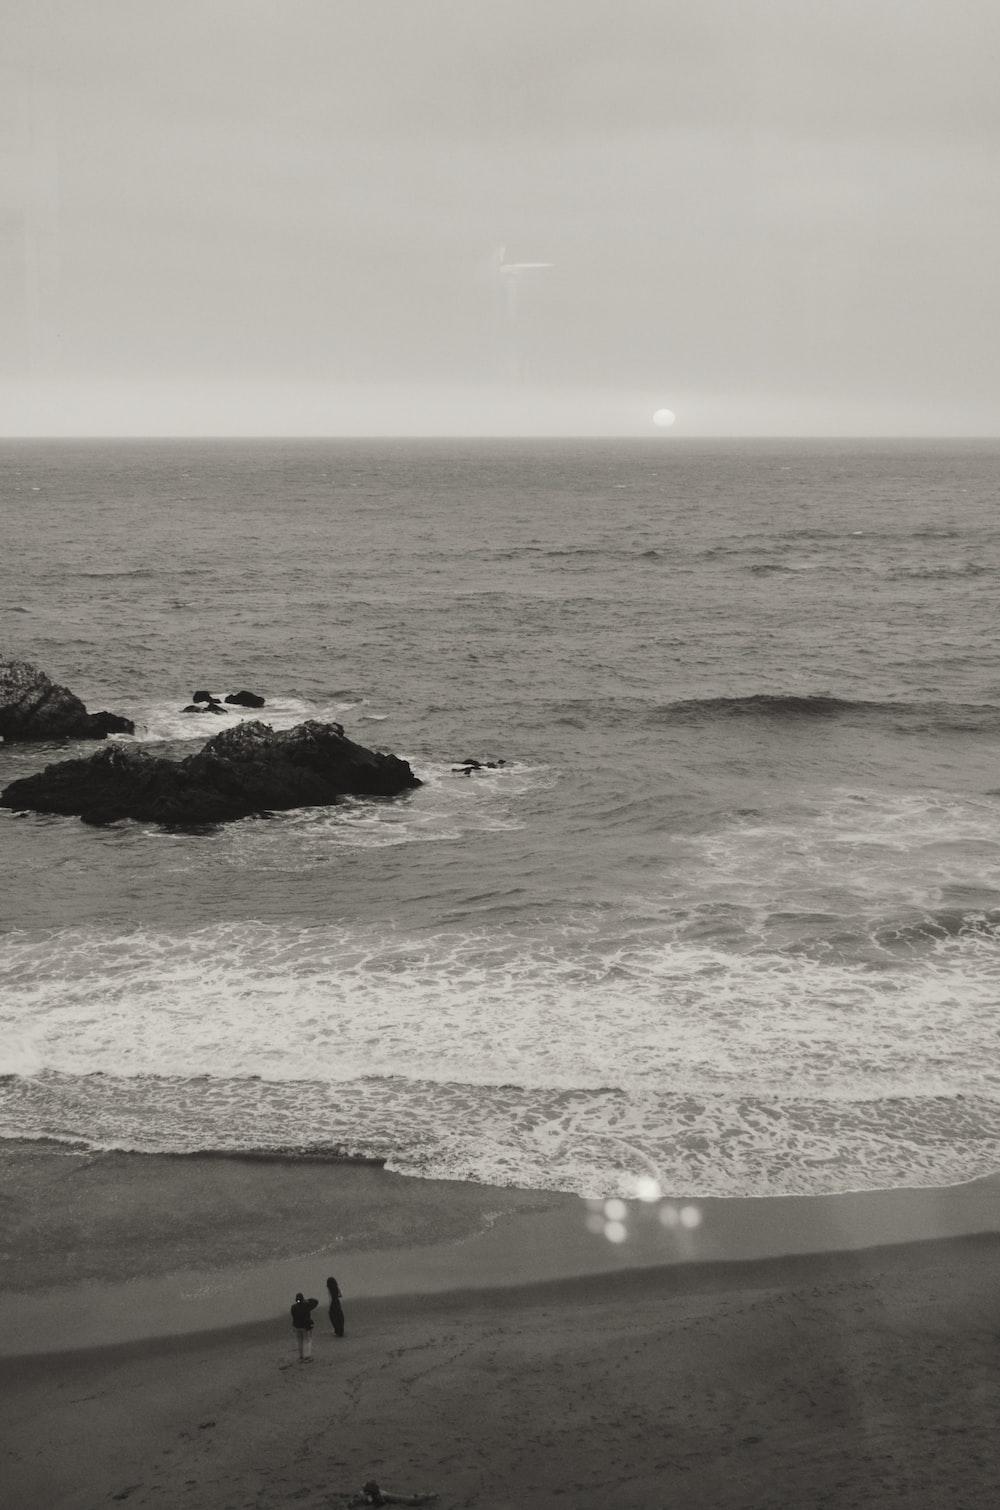 grayscale photo of ocean waves crashing on rocks